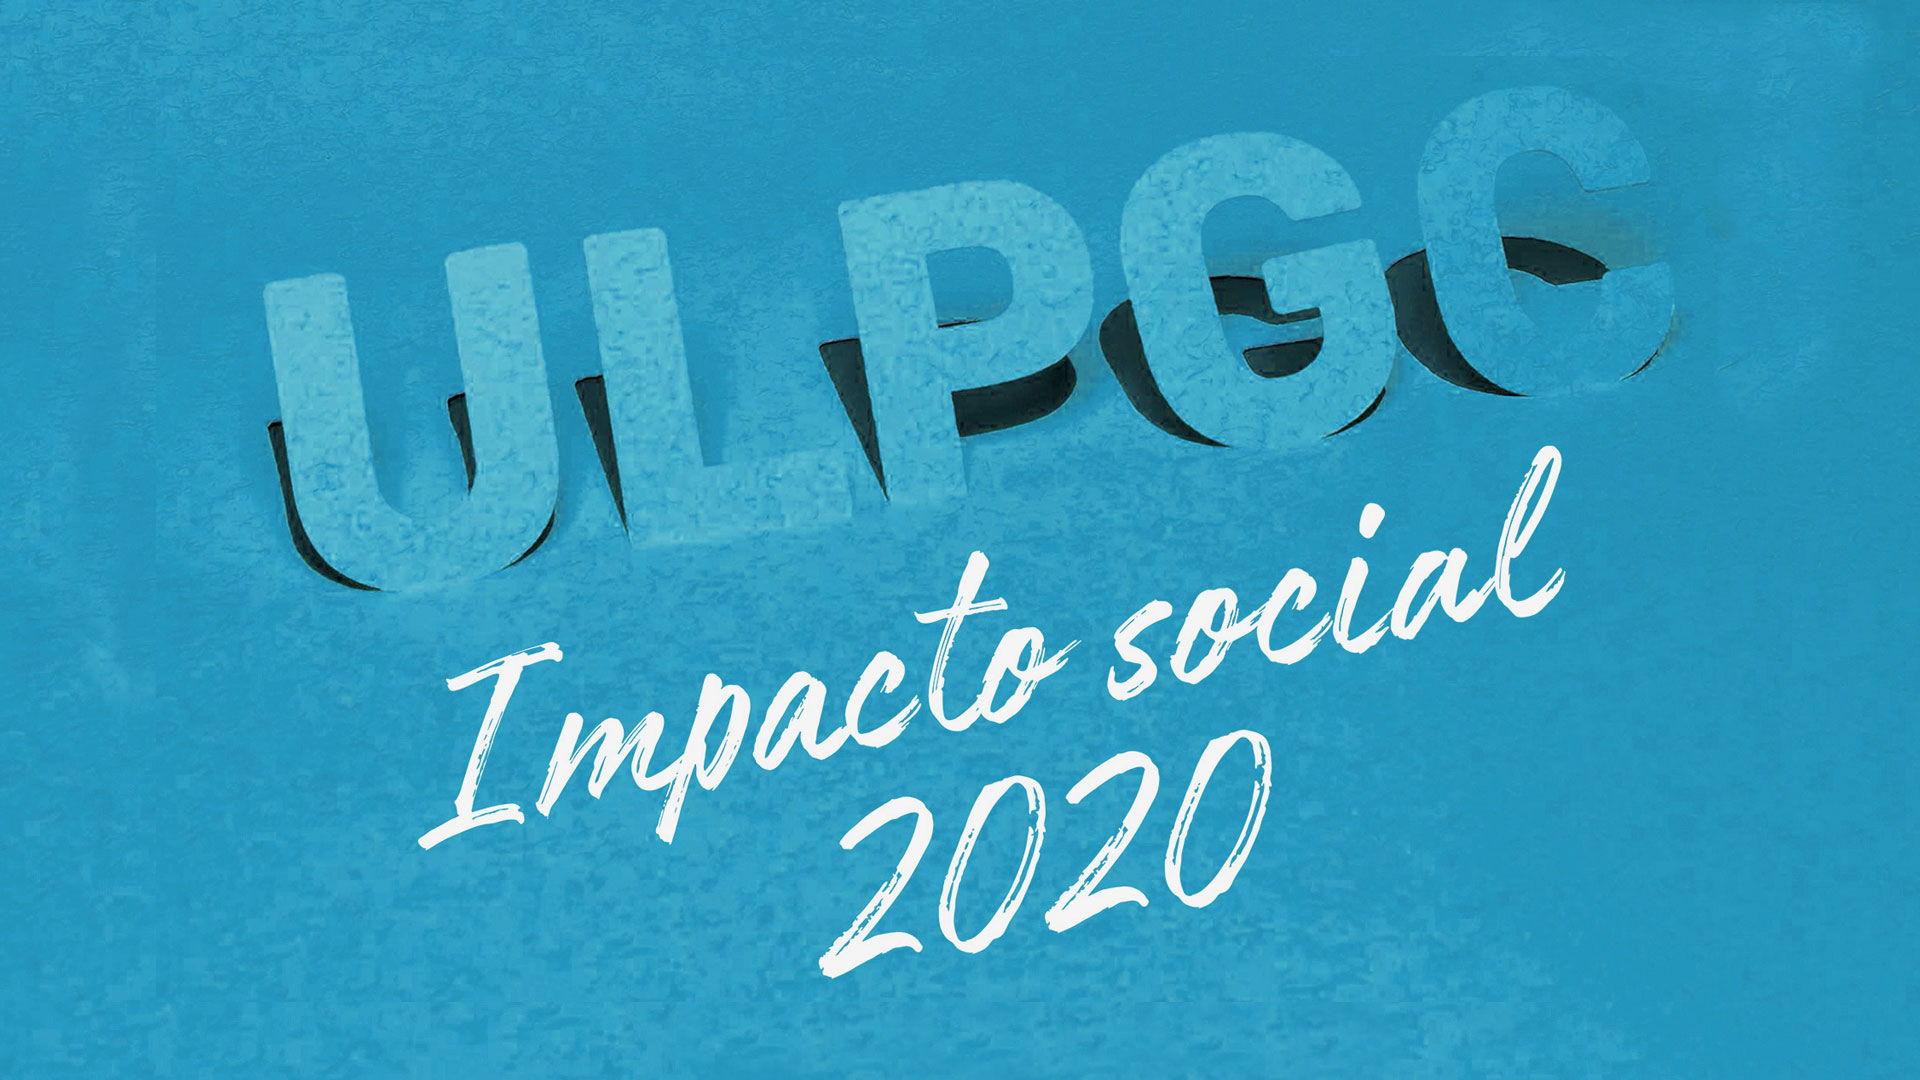 Imagen ULPGC Impacto Social 2020